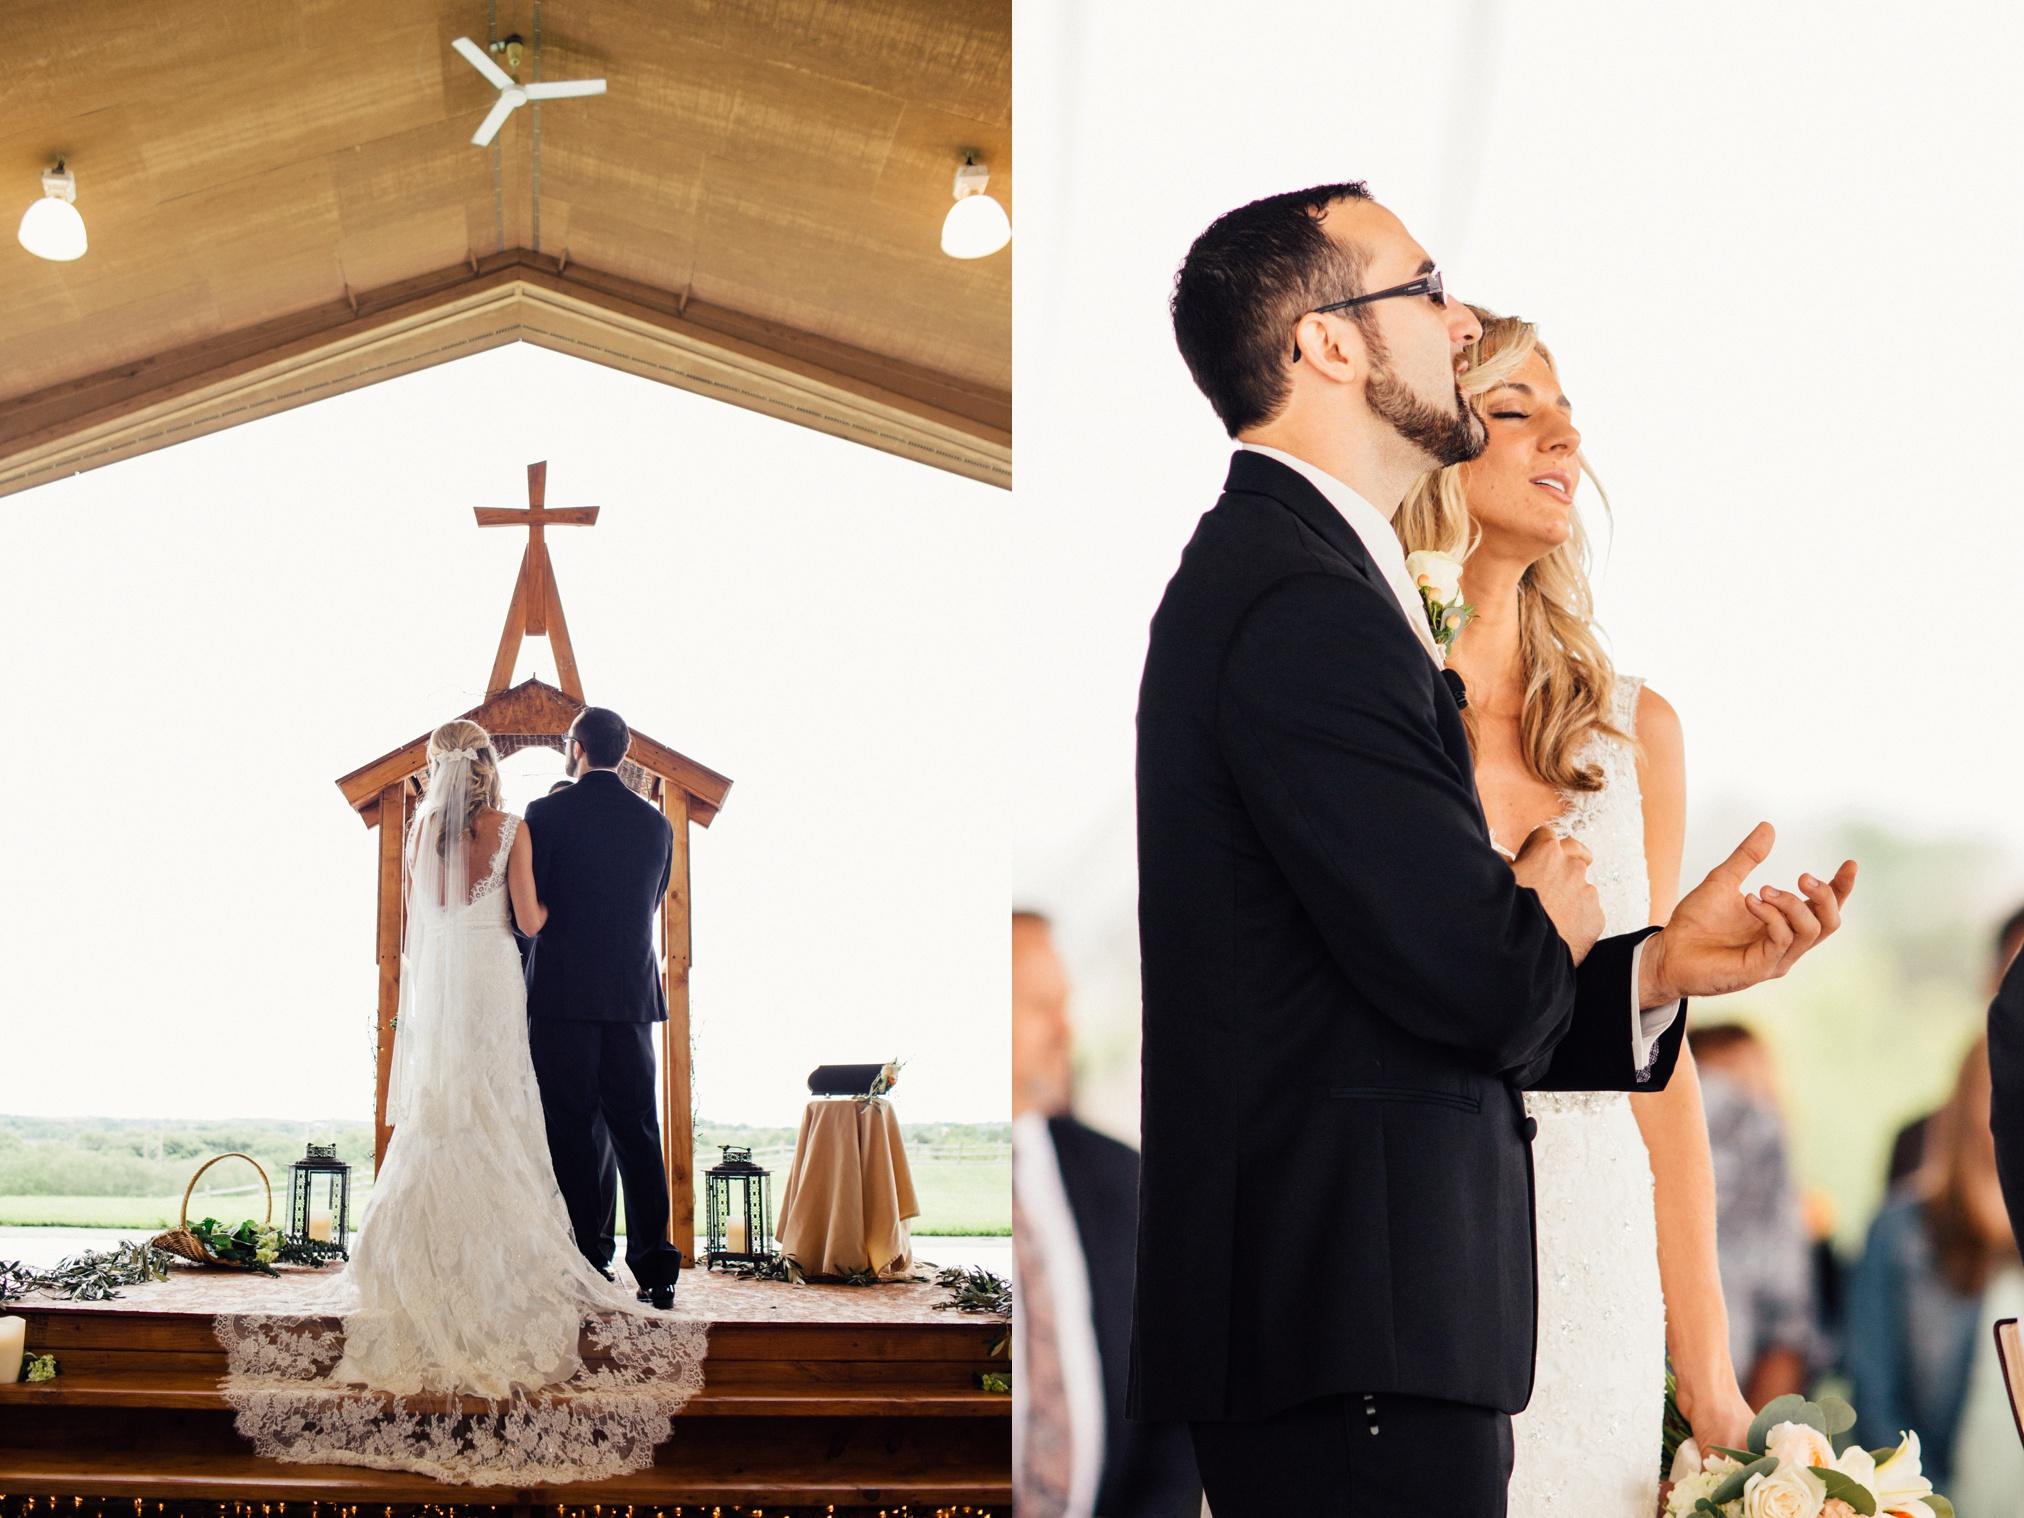 schmid_wedding-434.jpg